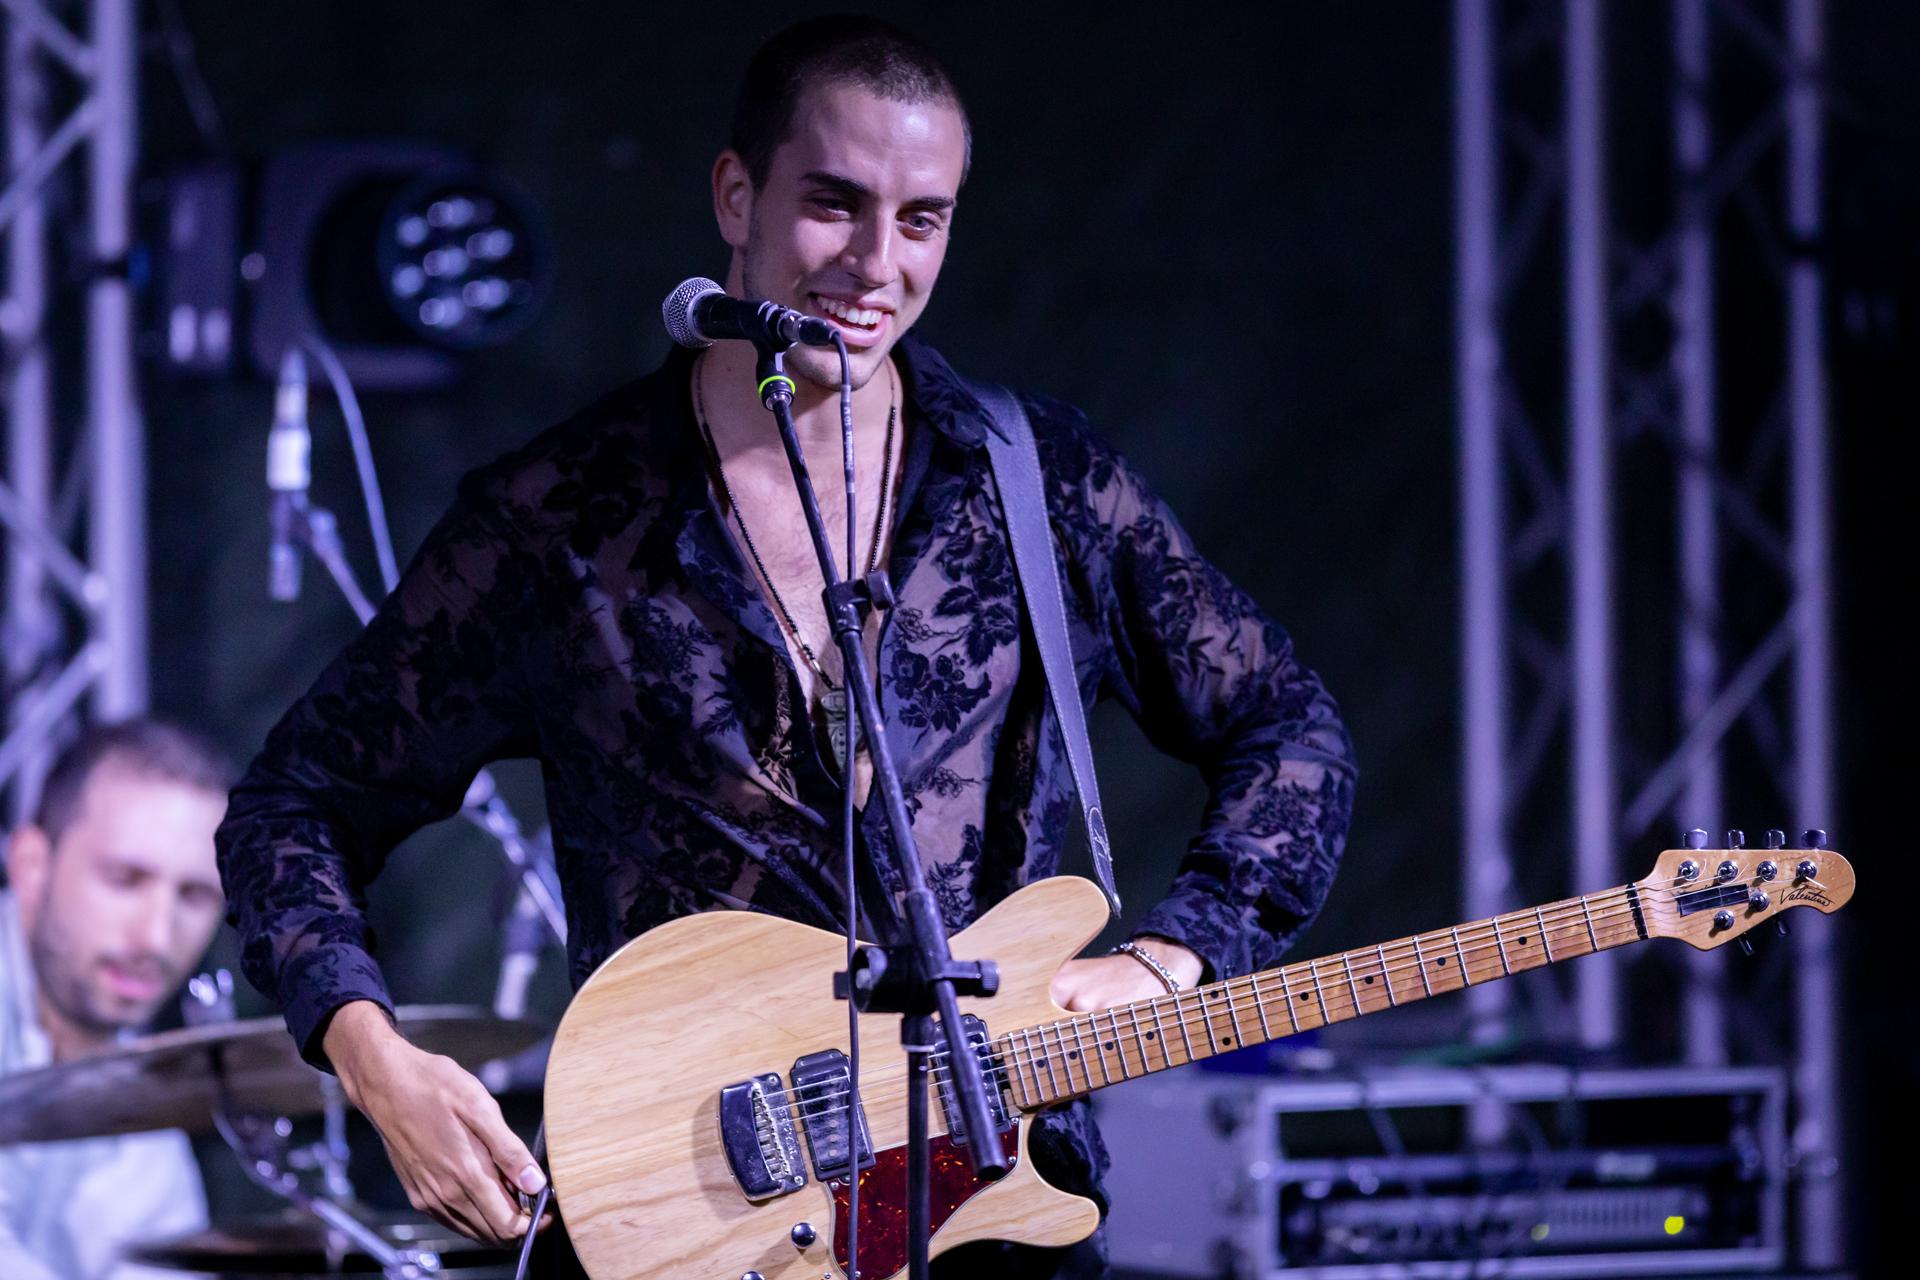 2019_09_07-KEEMOSABE-Rock-for-Fer-©-Luca-Vantusso-214330-5D4B5905